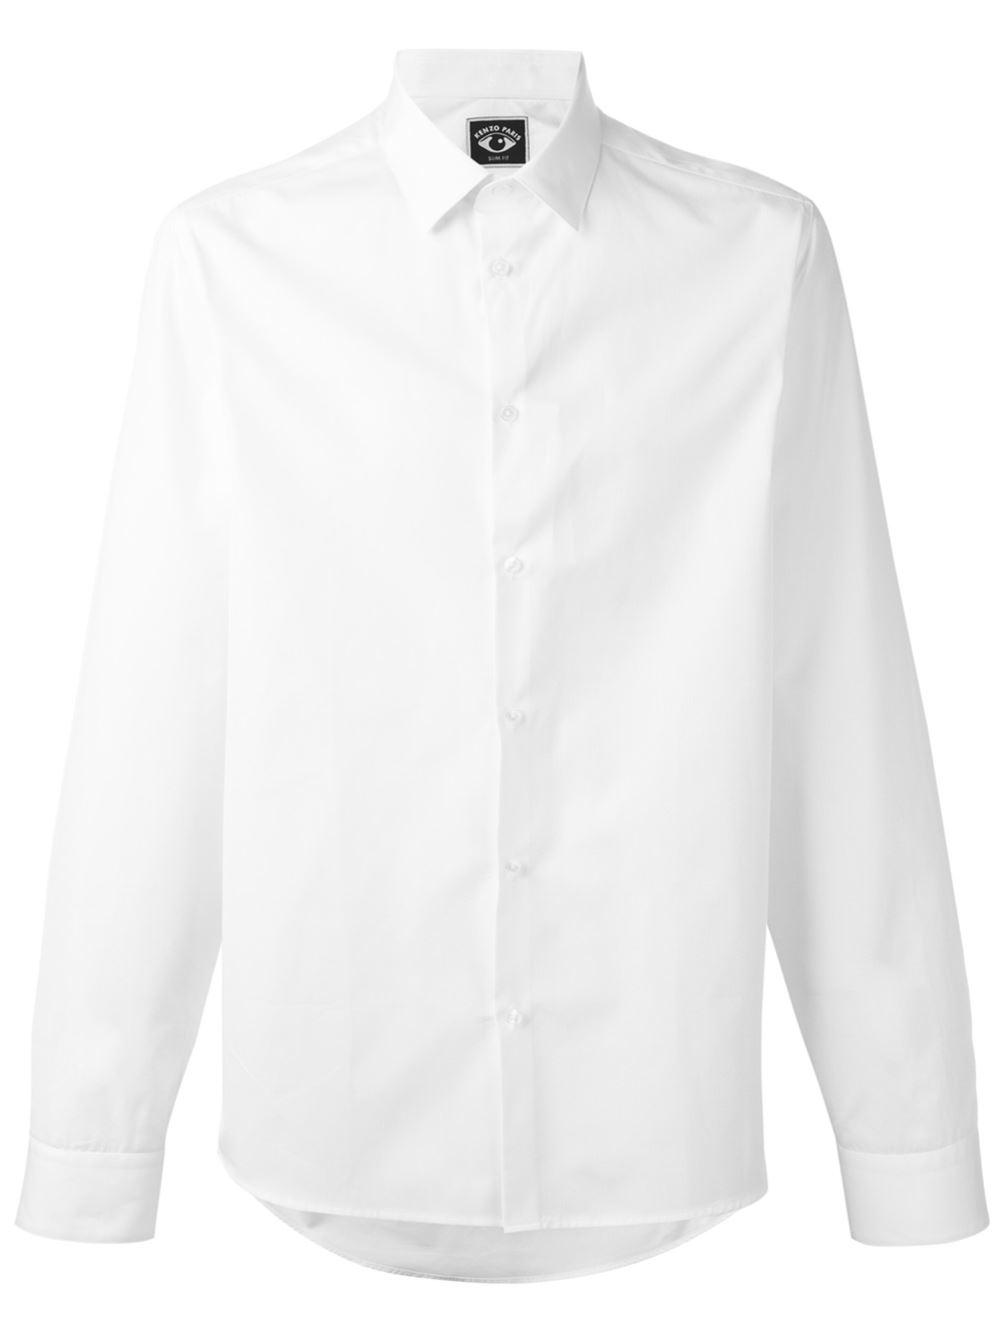 Kenzo cutaway collar shirt in multicolor for men white for White cutaway collar shirt